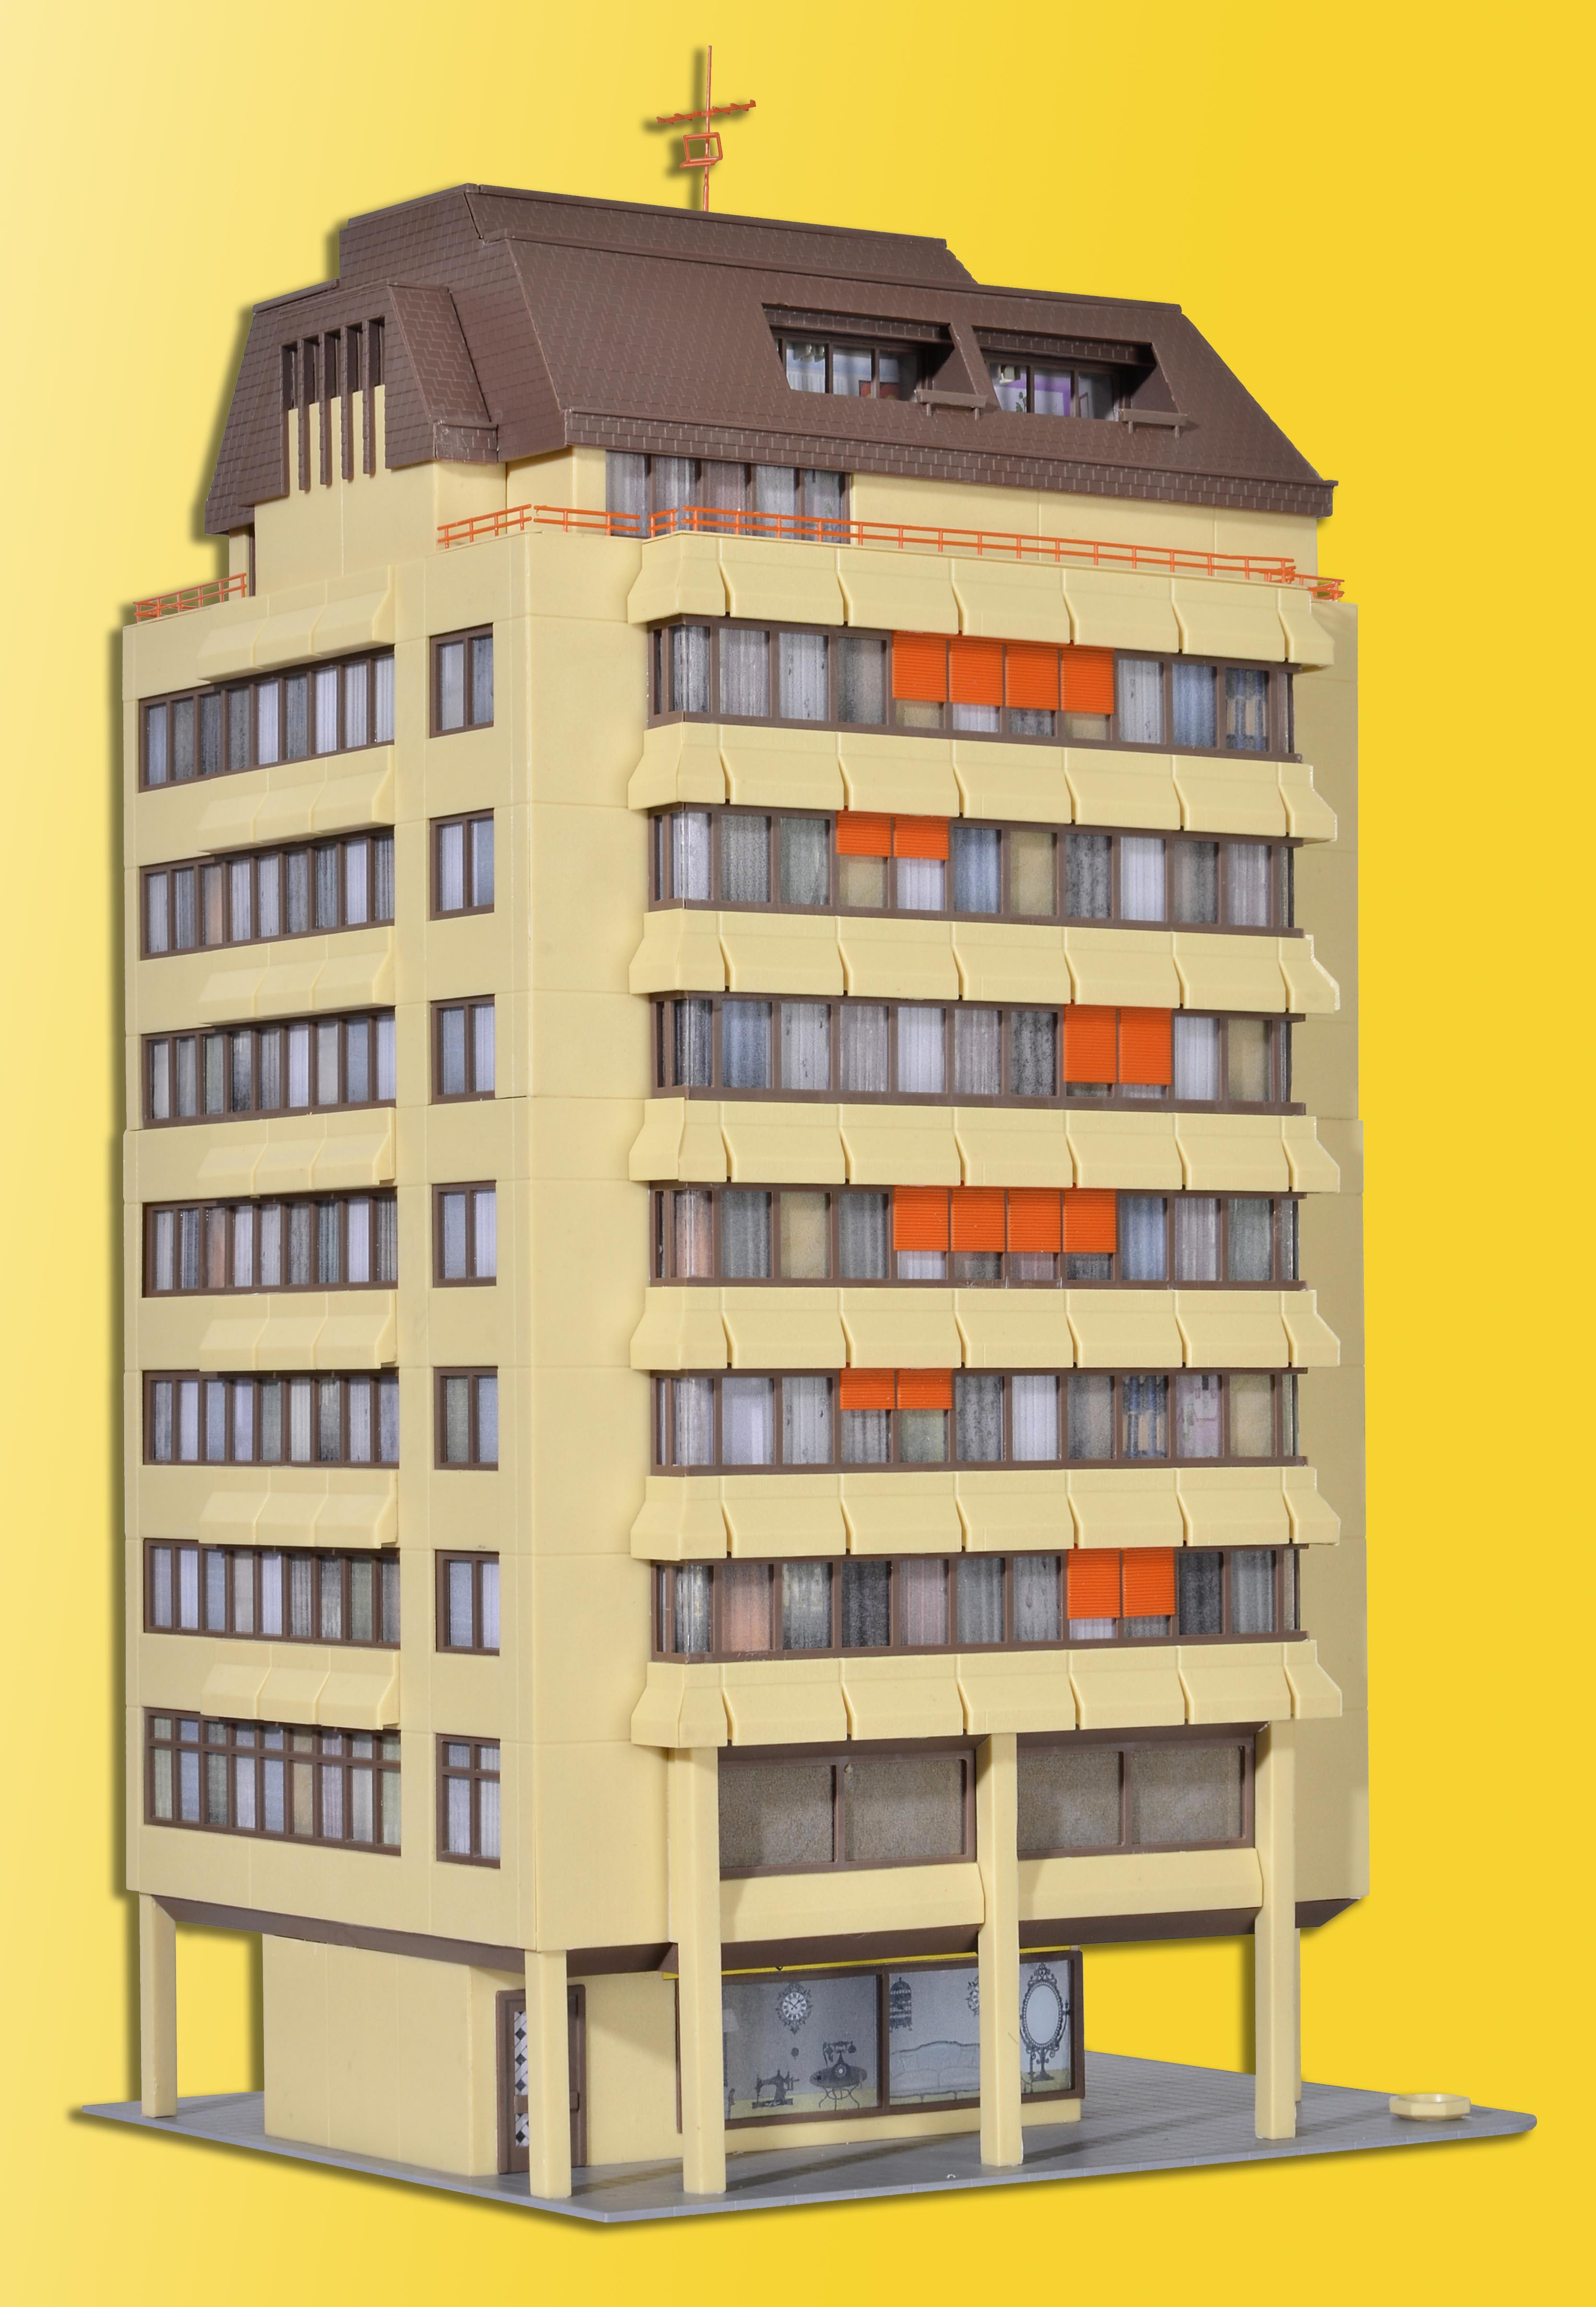 kibri 48218 <br/>Hochhaus inkl. EBL